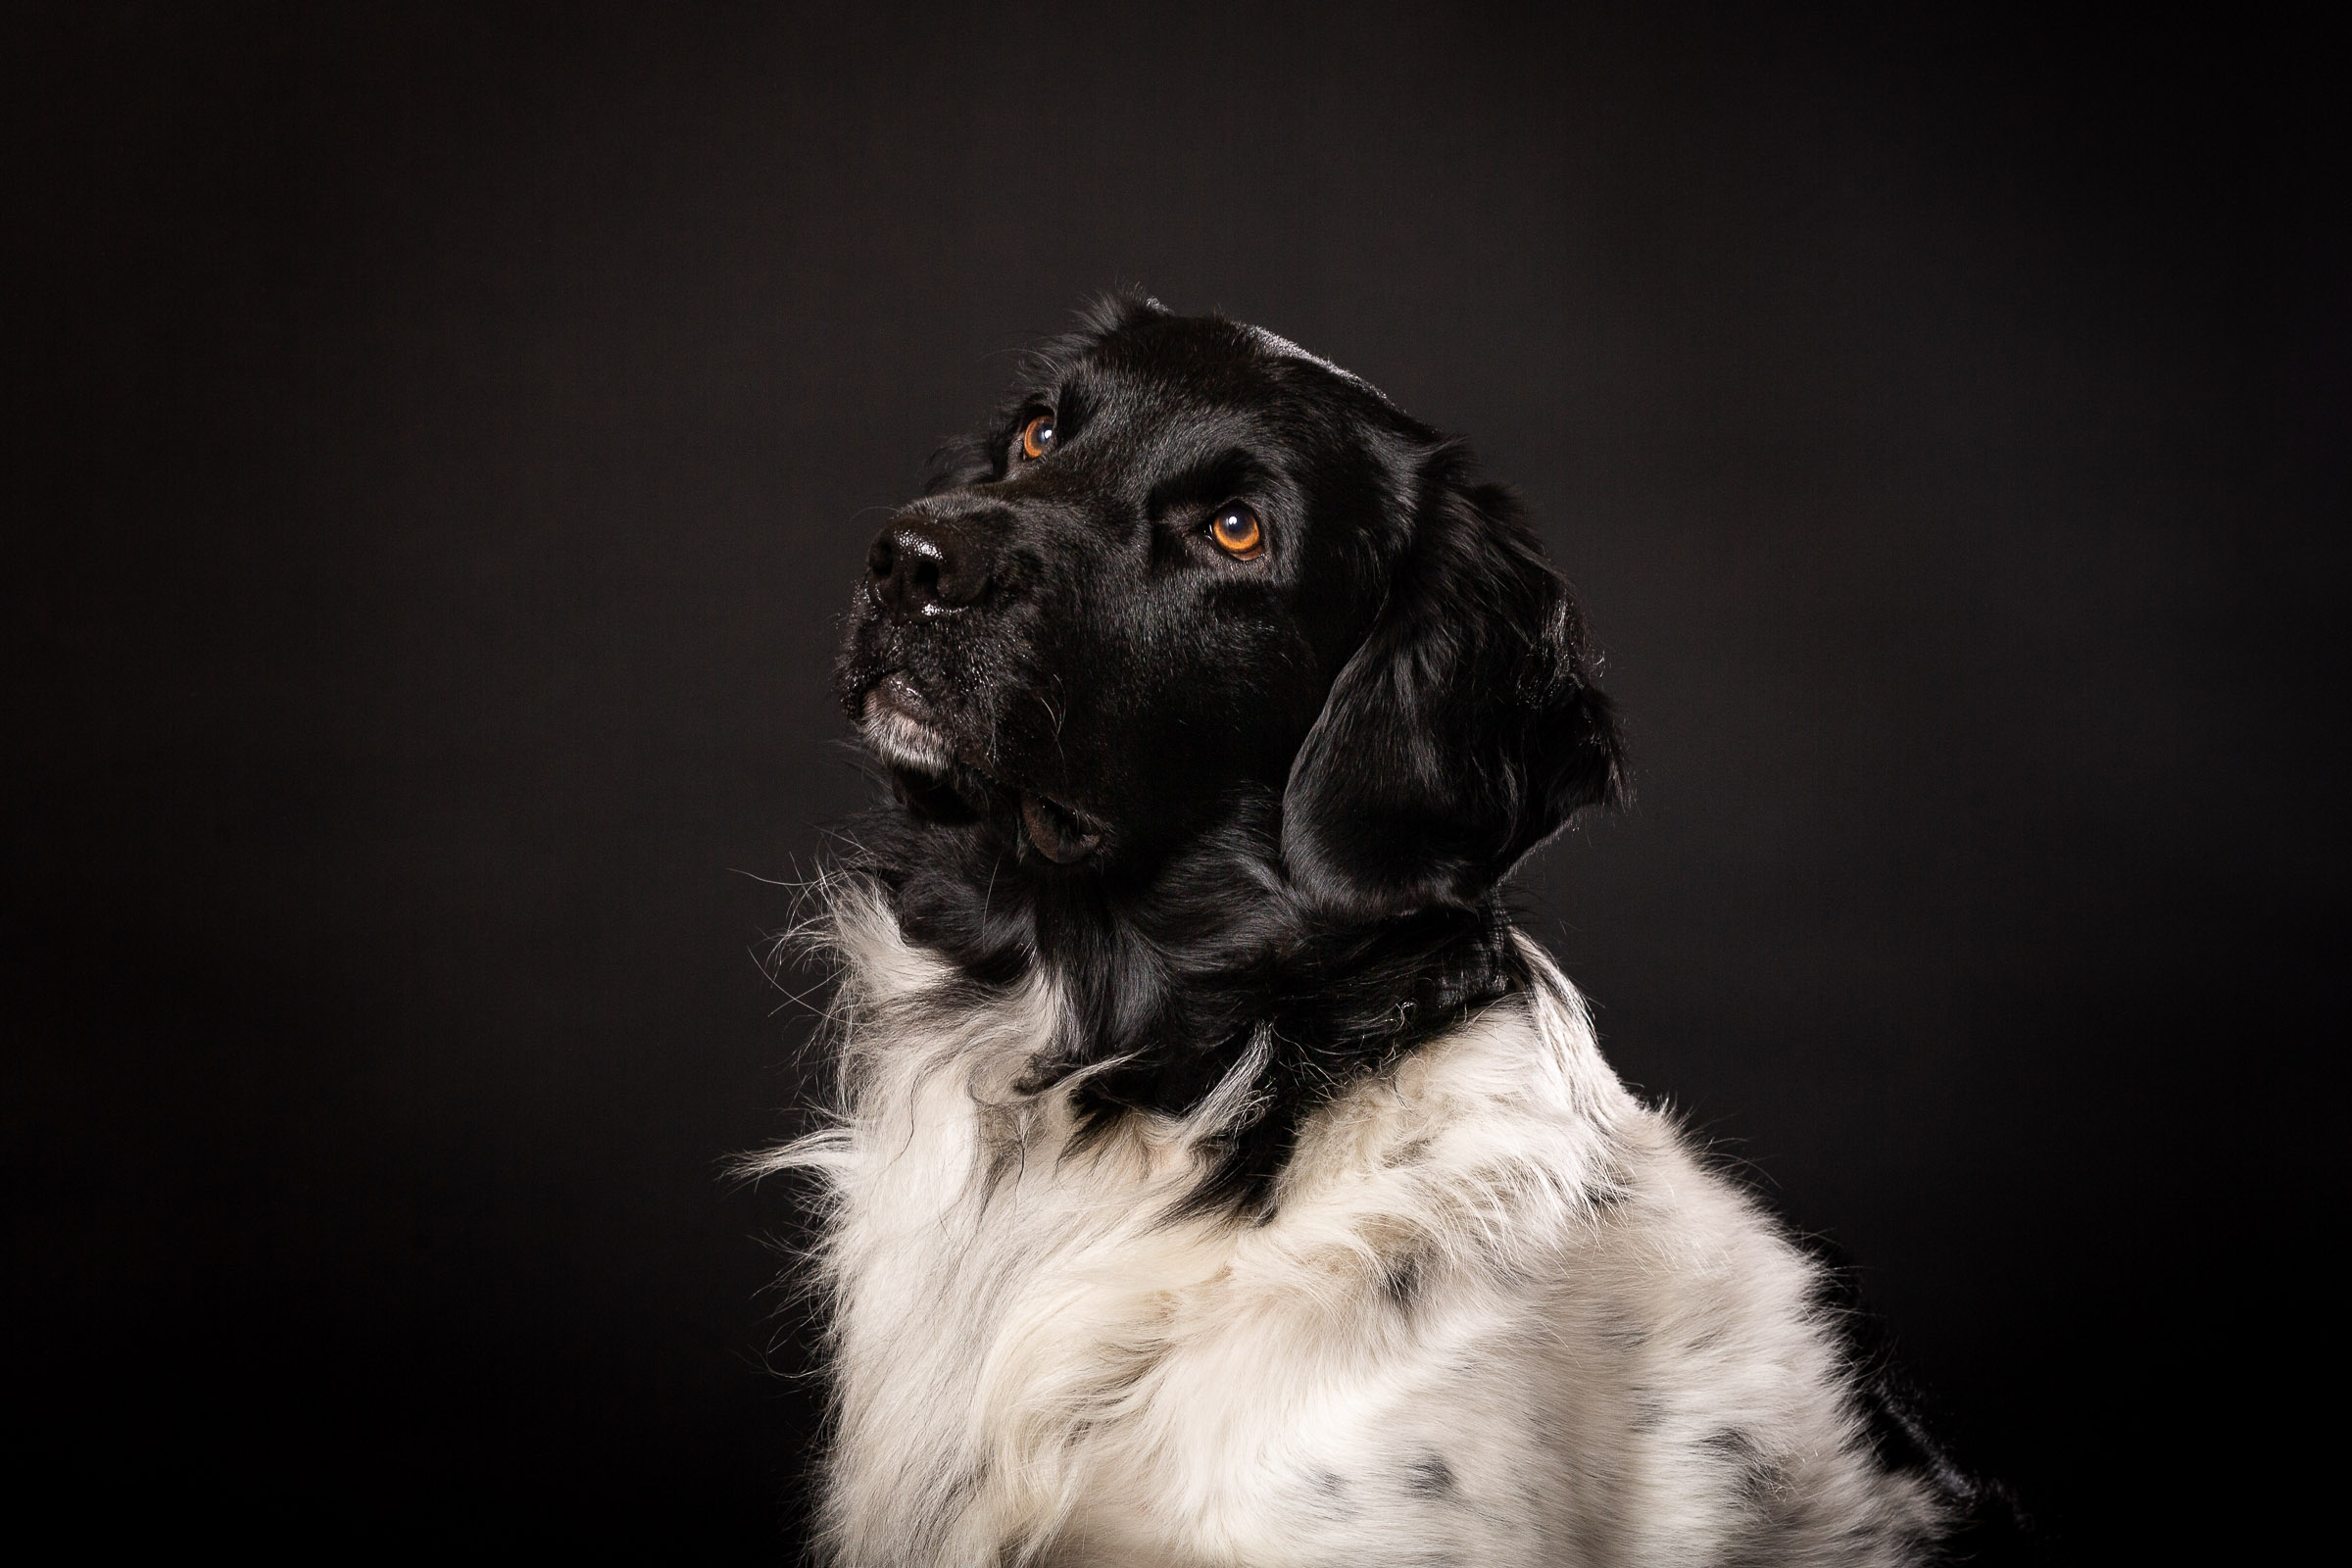 Friese Stabijhoun Boike portretfoto van zijn kop